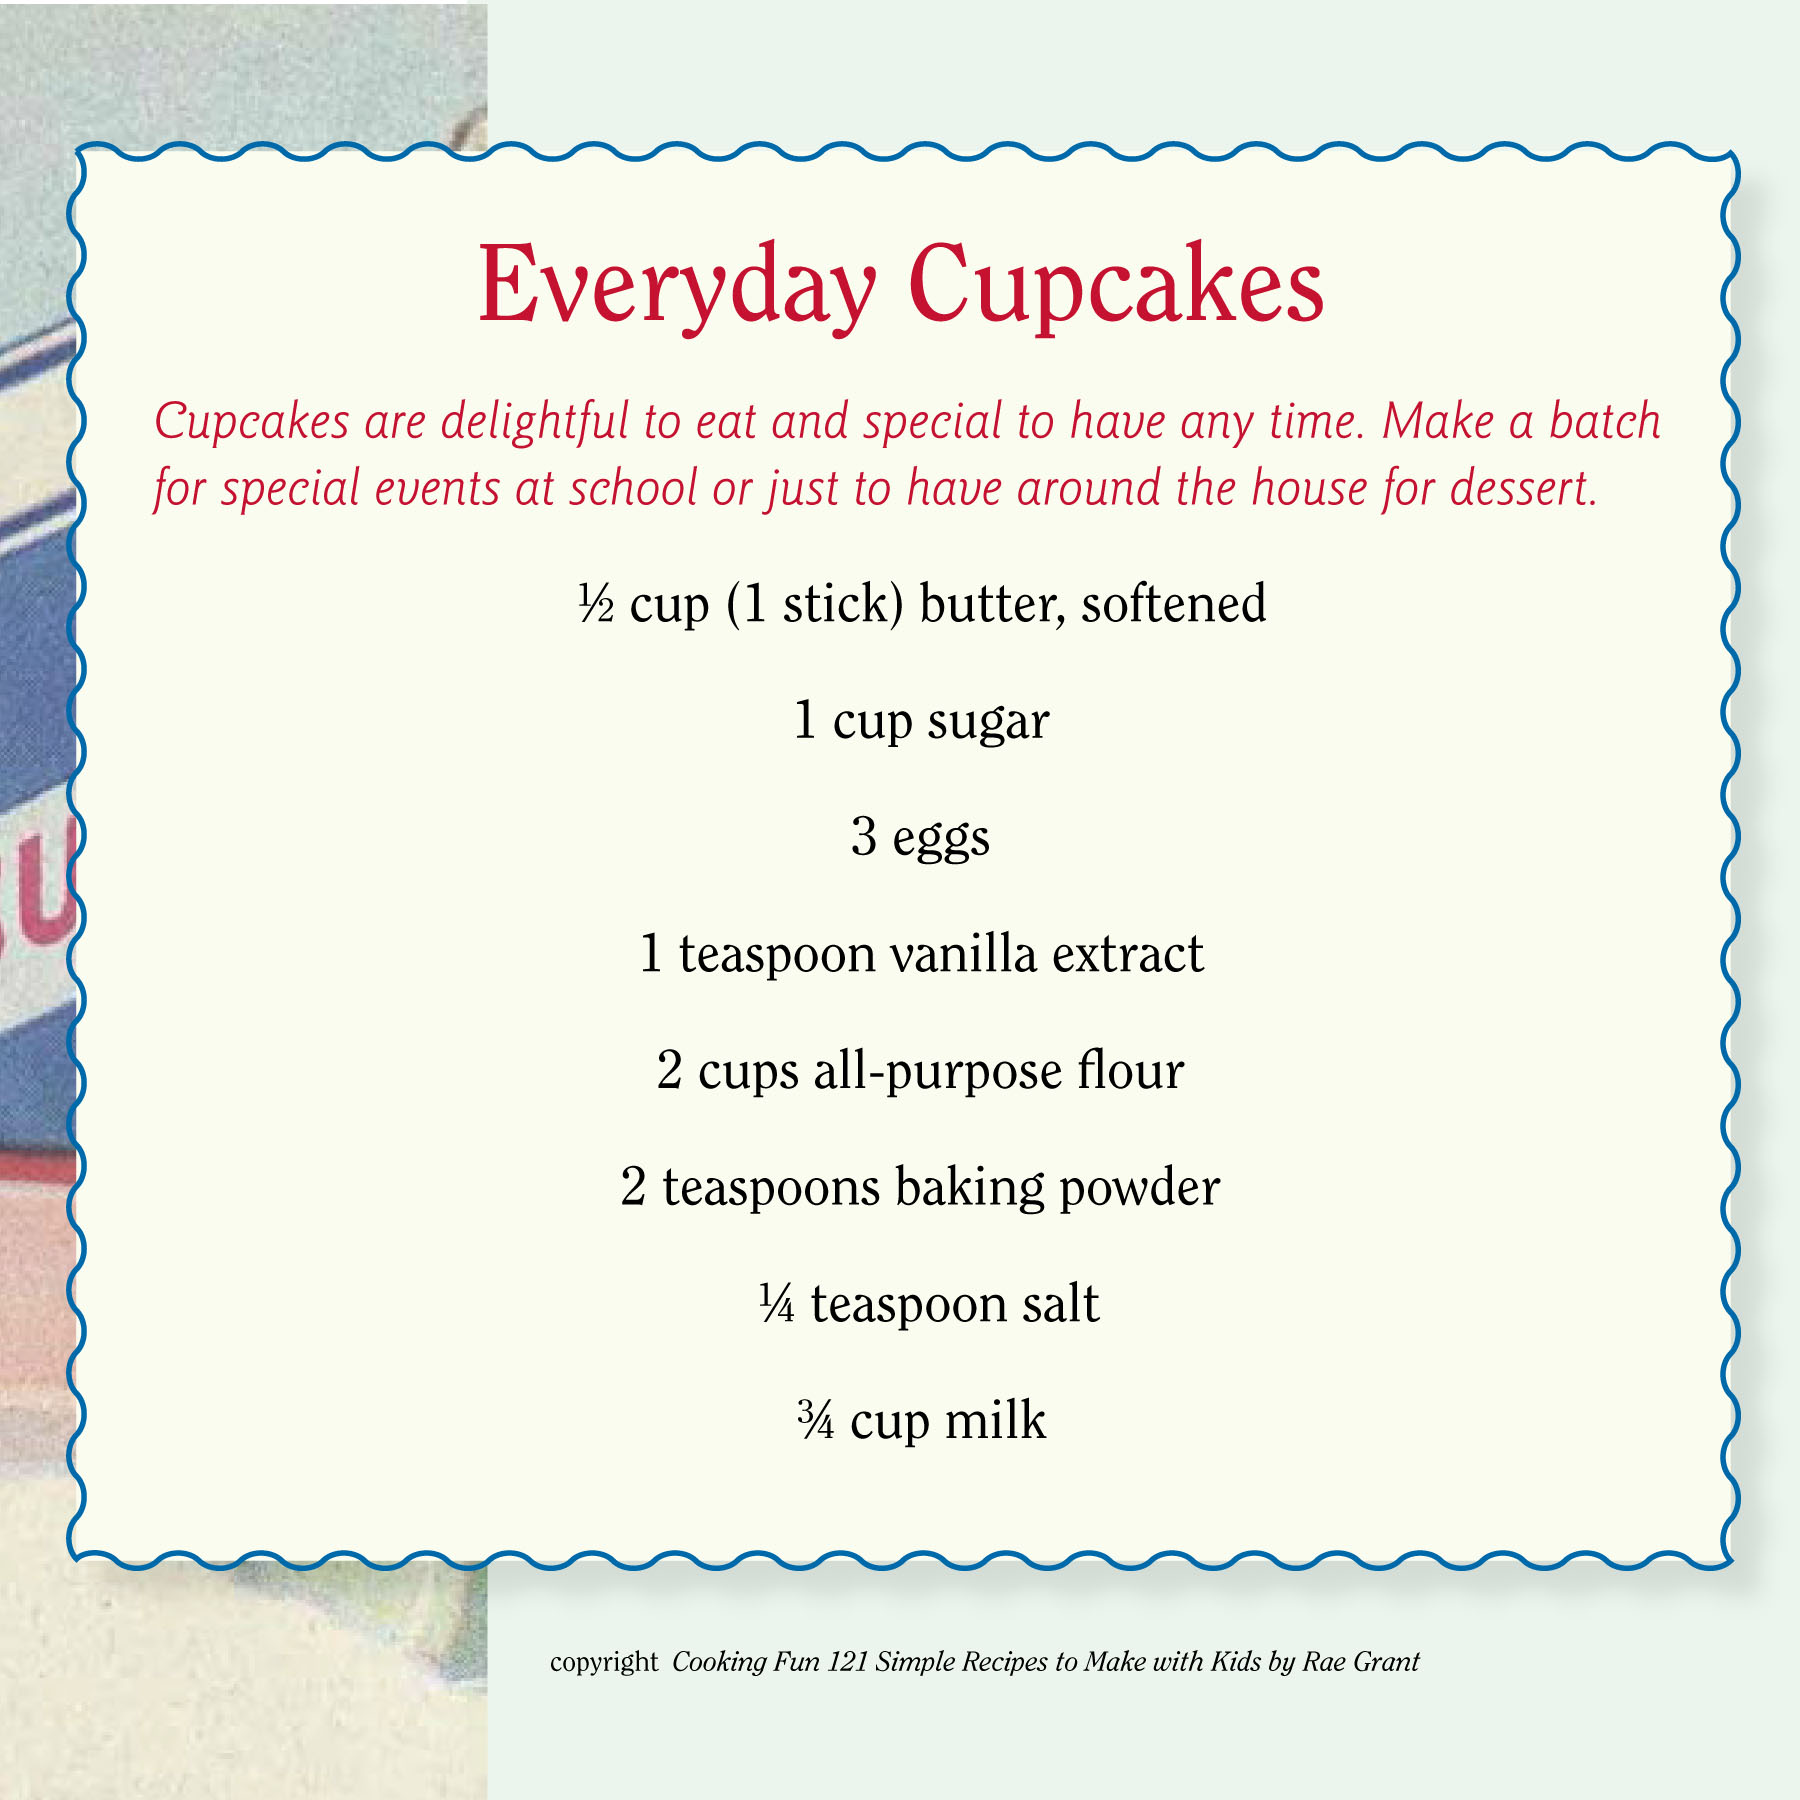 EVERYDAY CUPCAKE RECIPE CARD pg 1